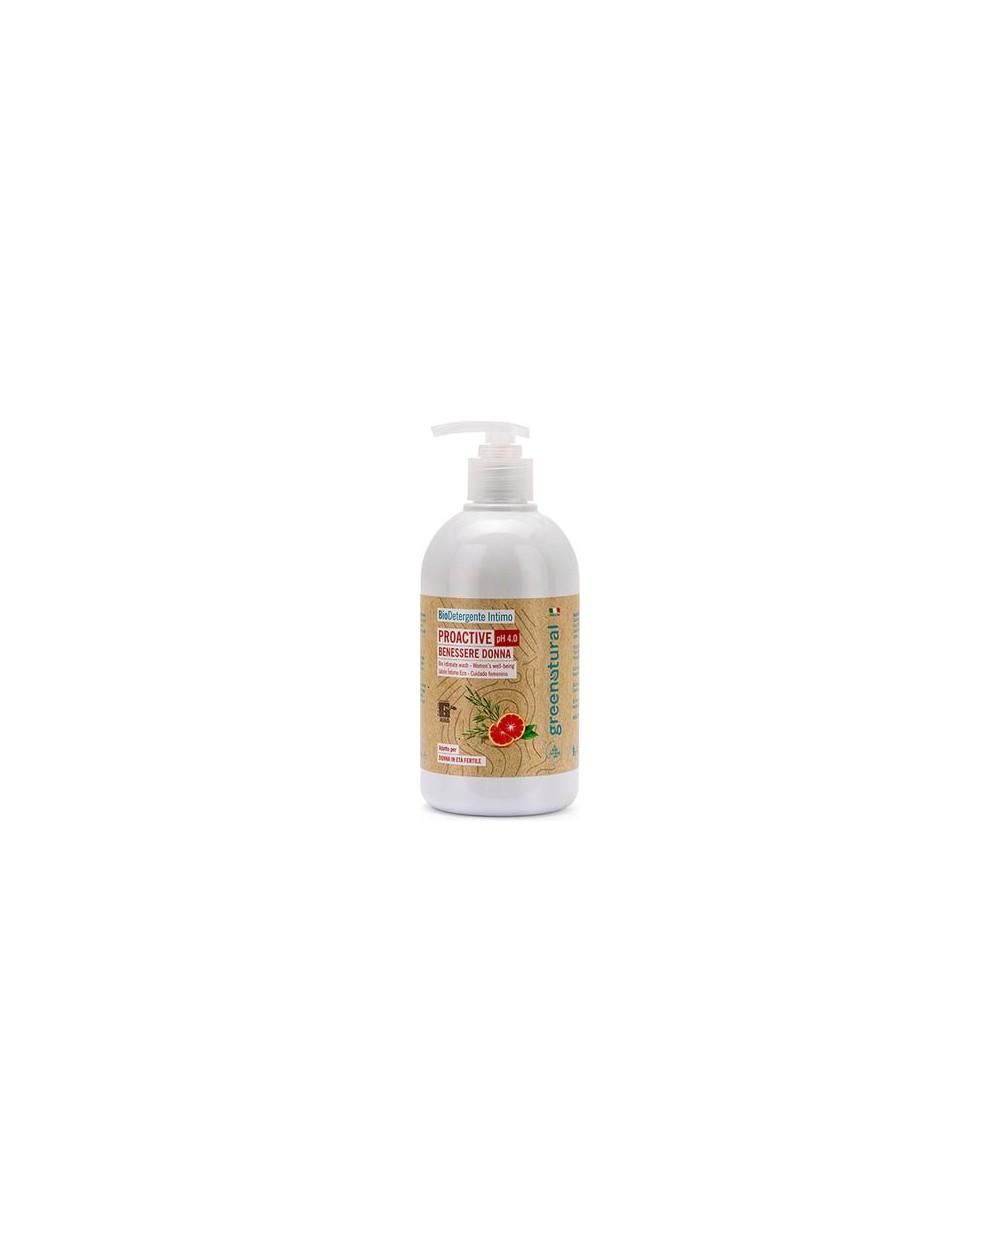 Greenatural - Bio Detergente intimo PROACTIVE pH.4.0